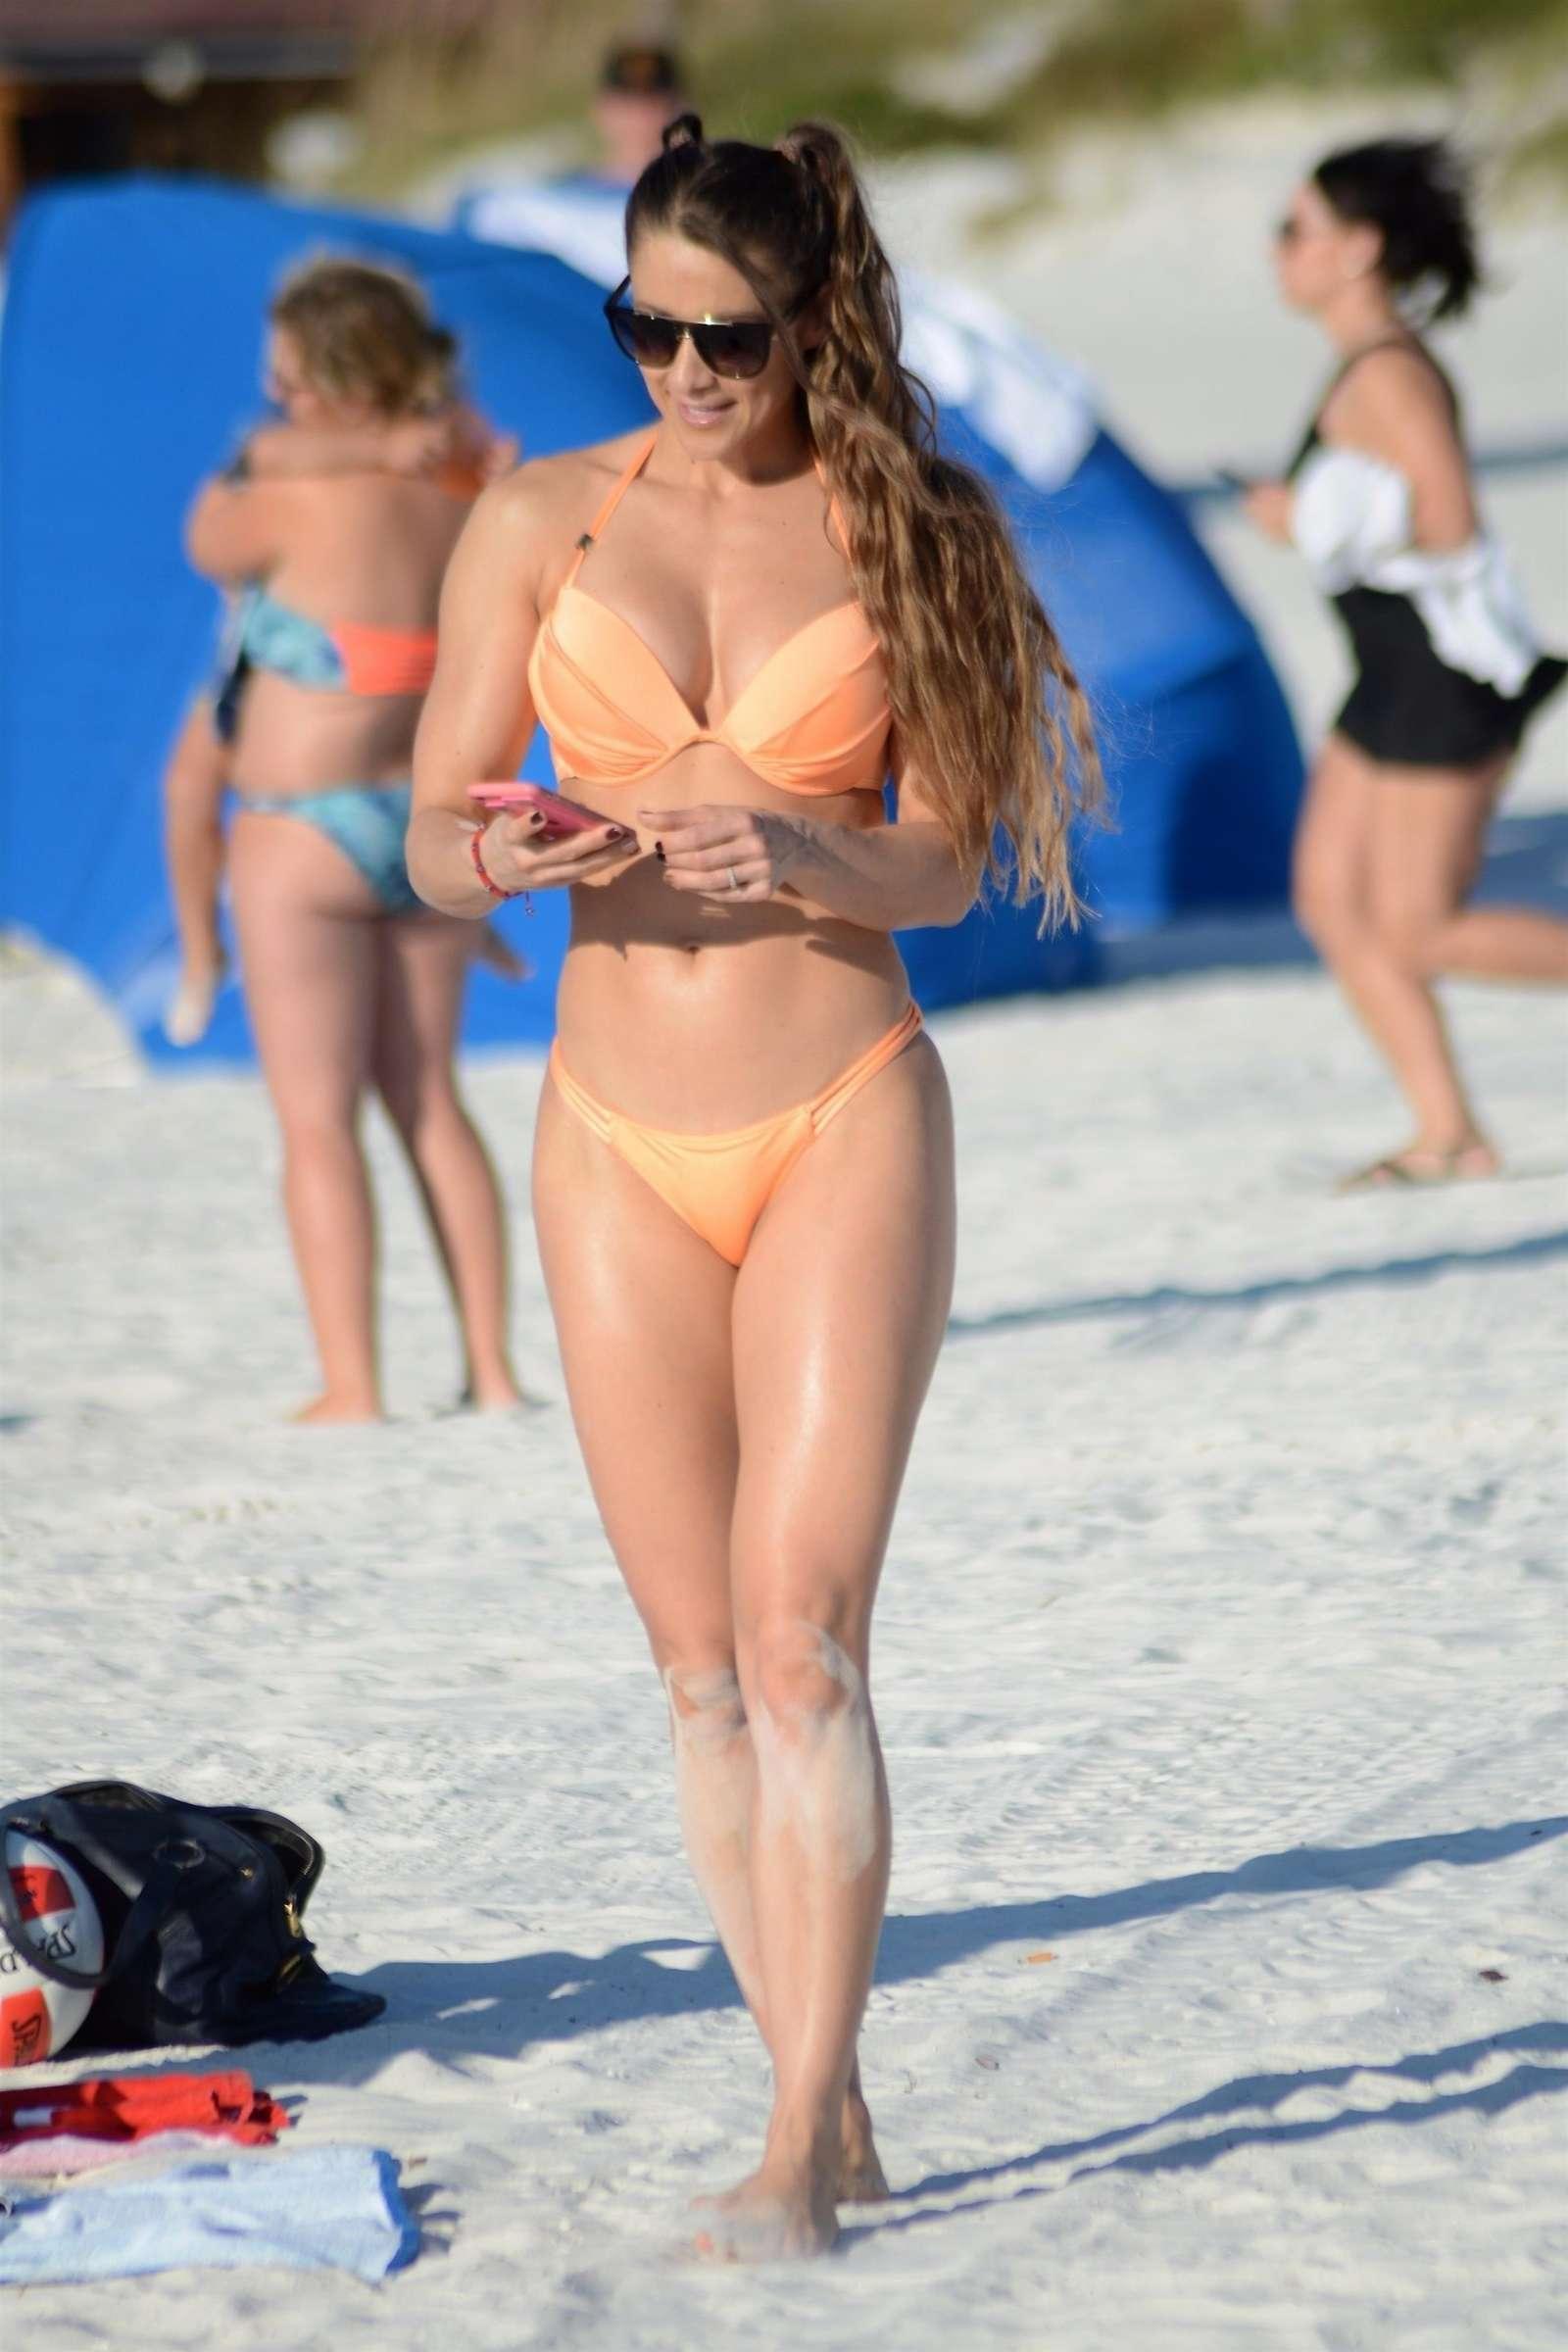 Topless Nicole Richie naked (68 photos), Topless, Bikini, Instagram, in bikini 2019